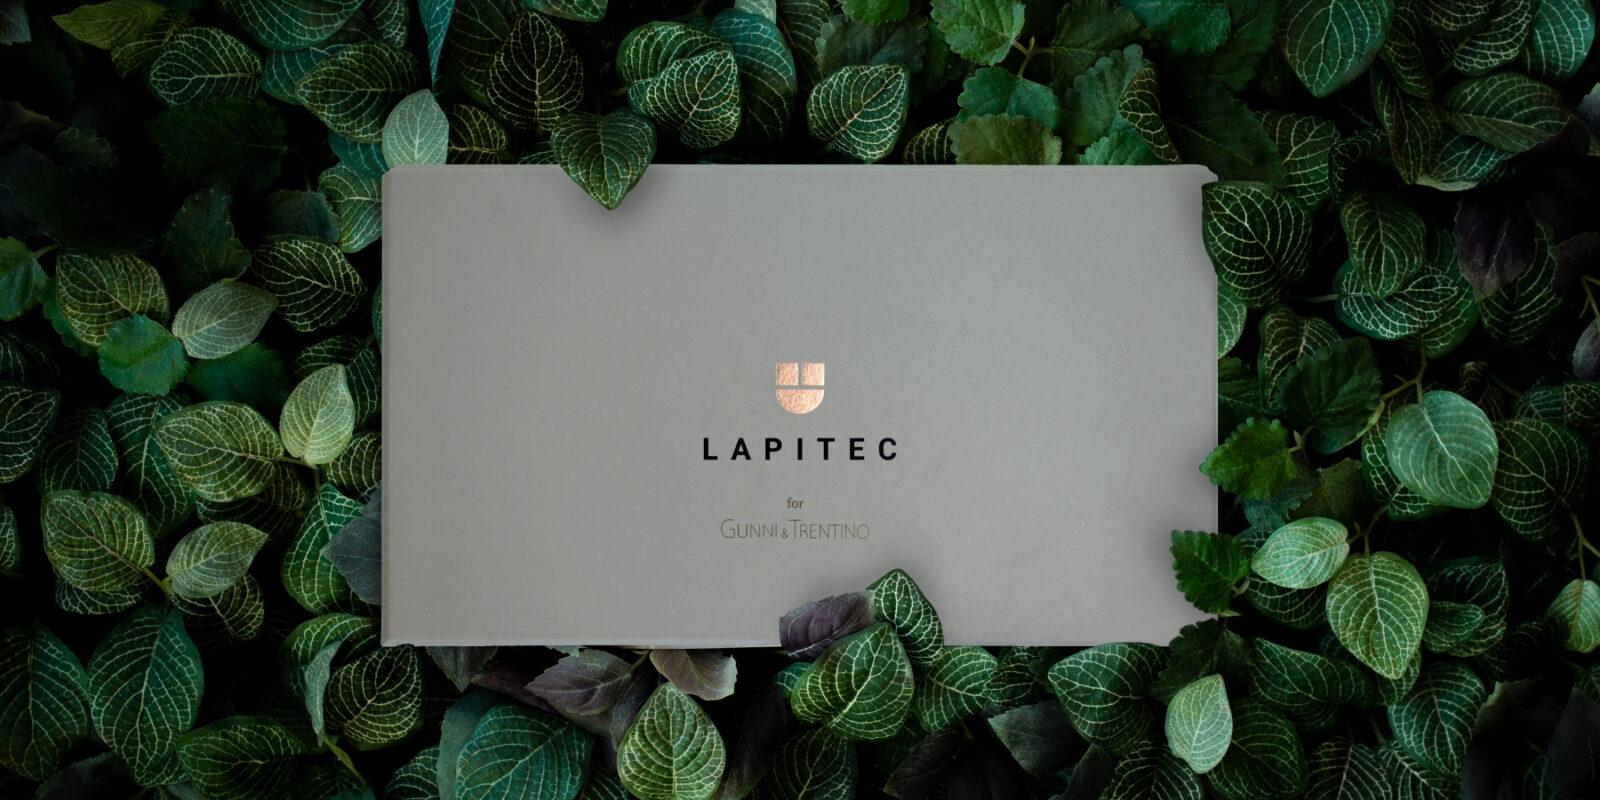 Lapitec for Gunni Trentino